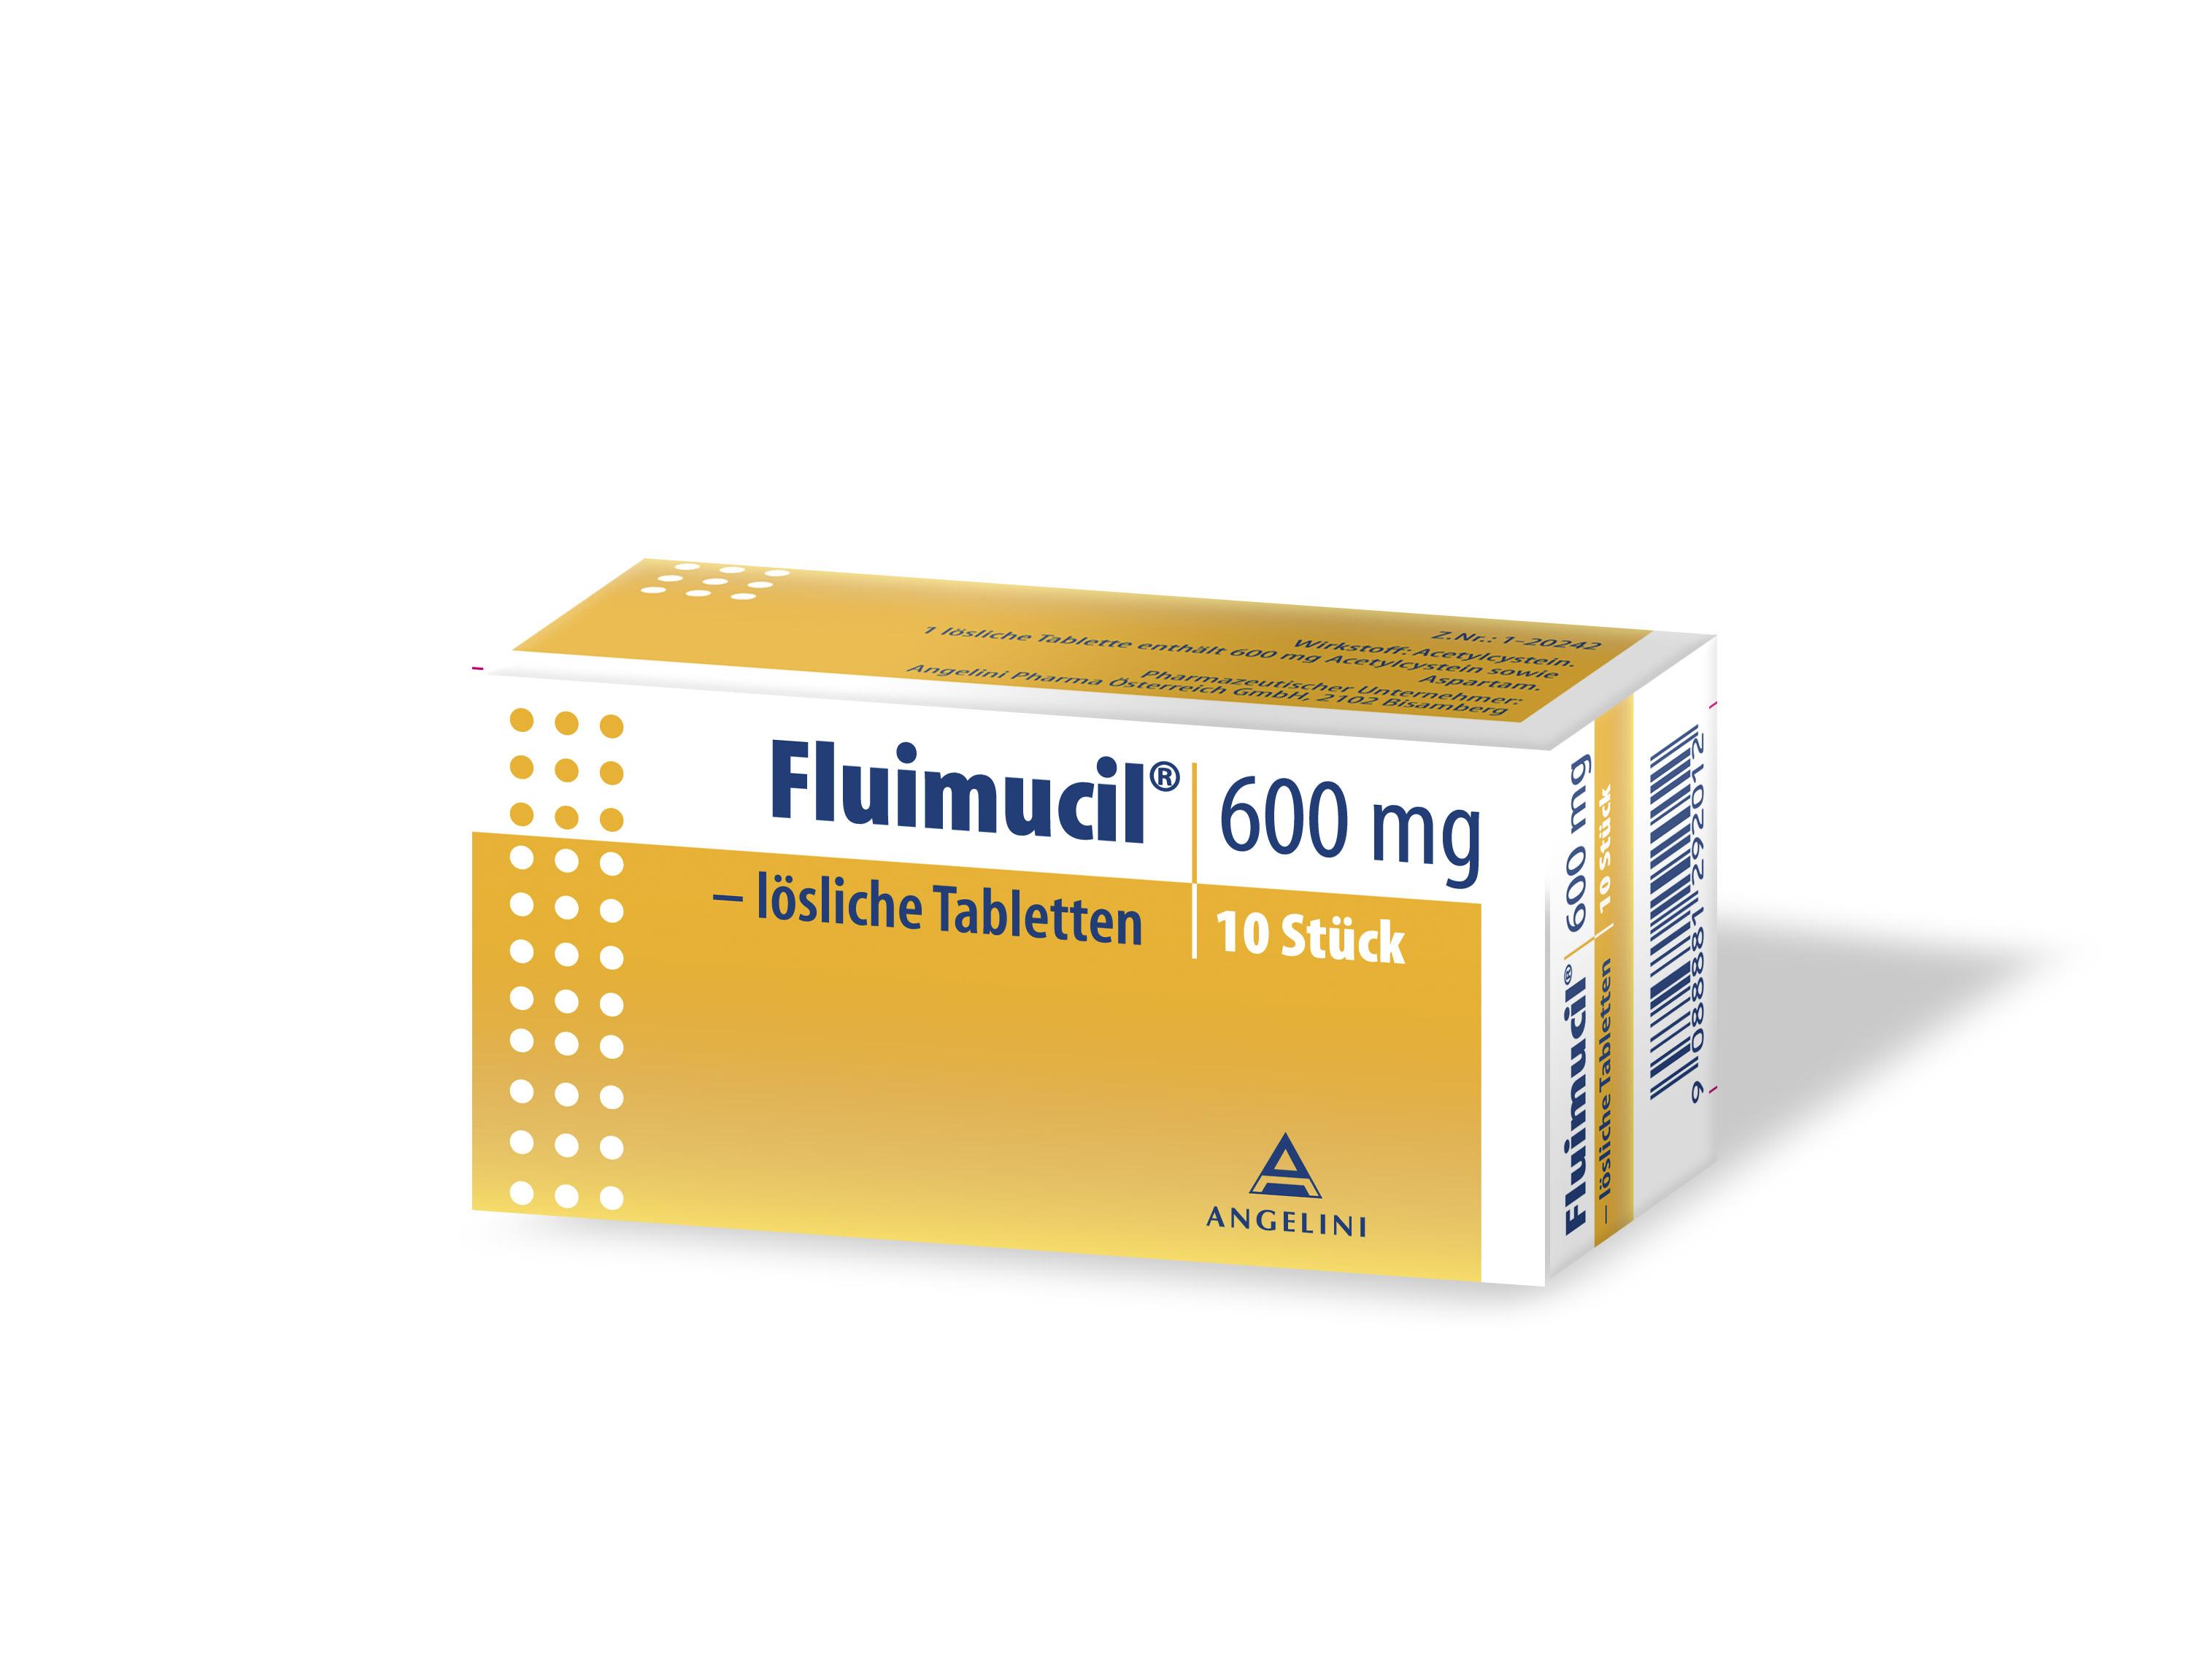 Fluimucil 600 mg - lösliche Tabletten